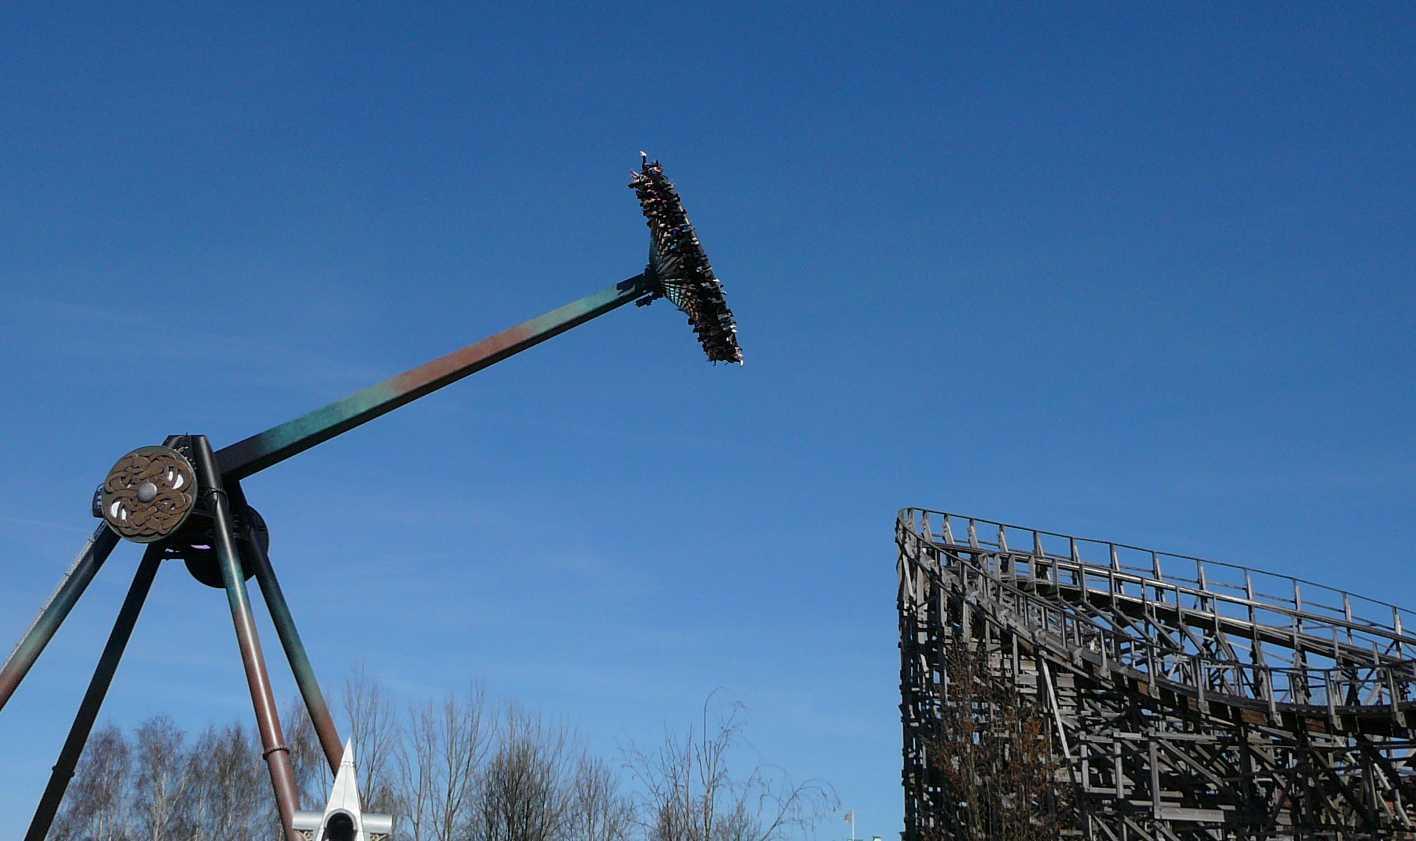 Intamin gyro swing loke wooden coaster balder